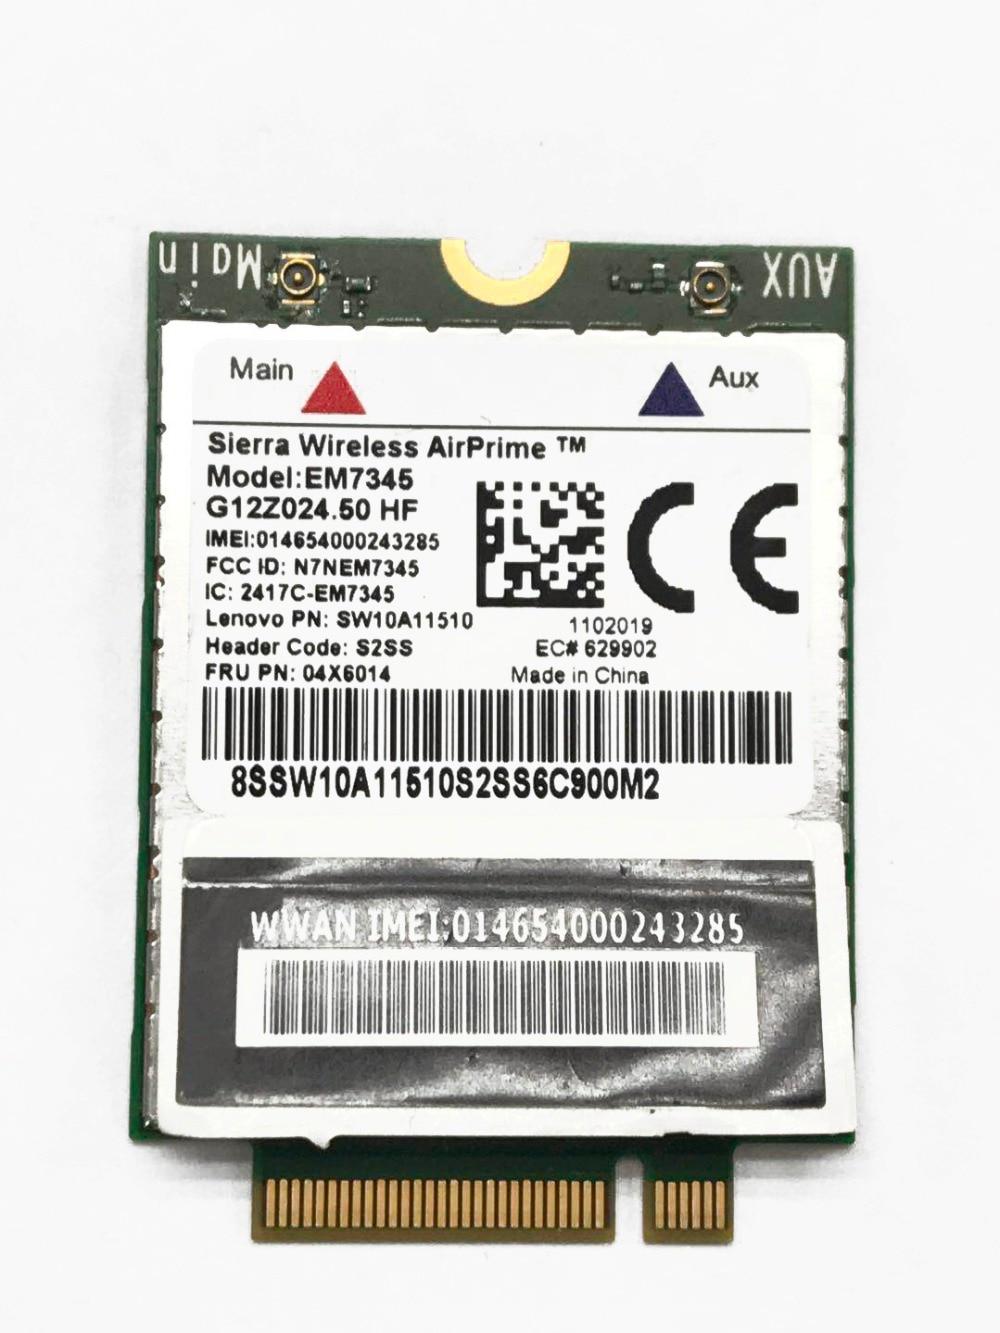 JINYUSHI offre spéciale!! EM7345 FRU 04X6014 neuf GOBI5000 Module 4G NGFF carte wwan pour thinkpad T440 W540 T440P T440s X240 X250